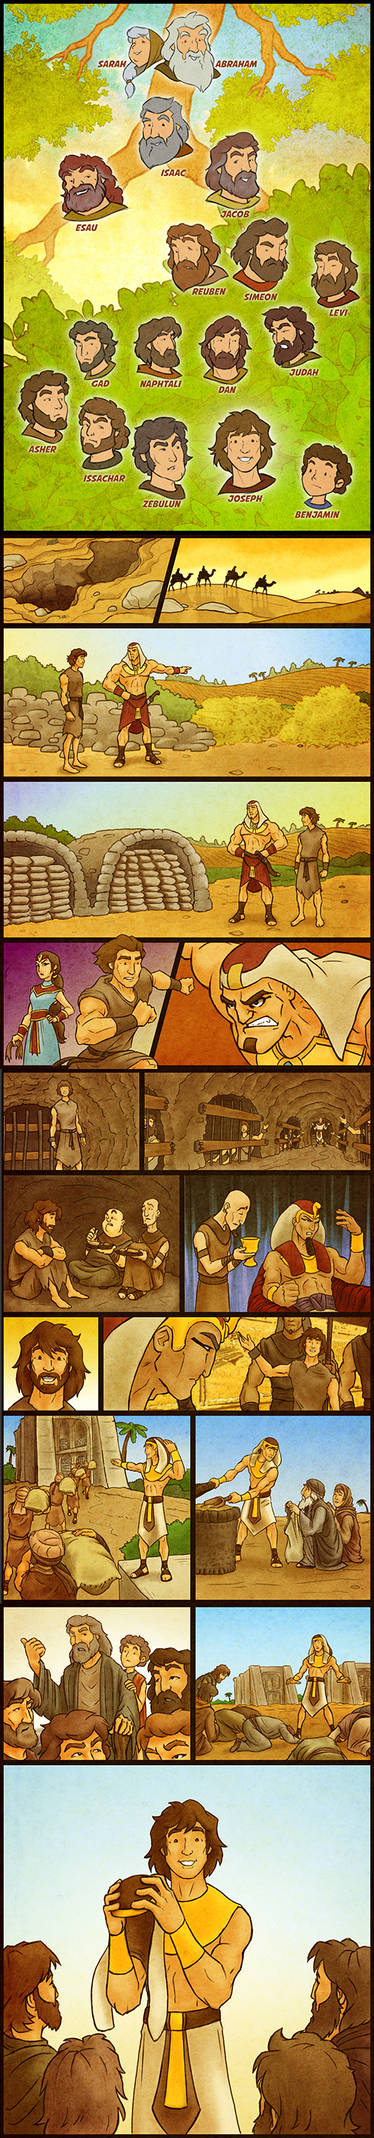 Joseph's Story Comic by eikonik